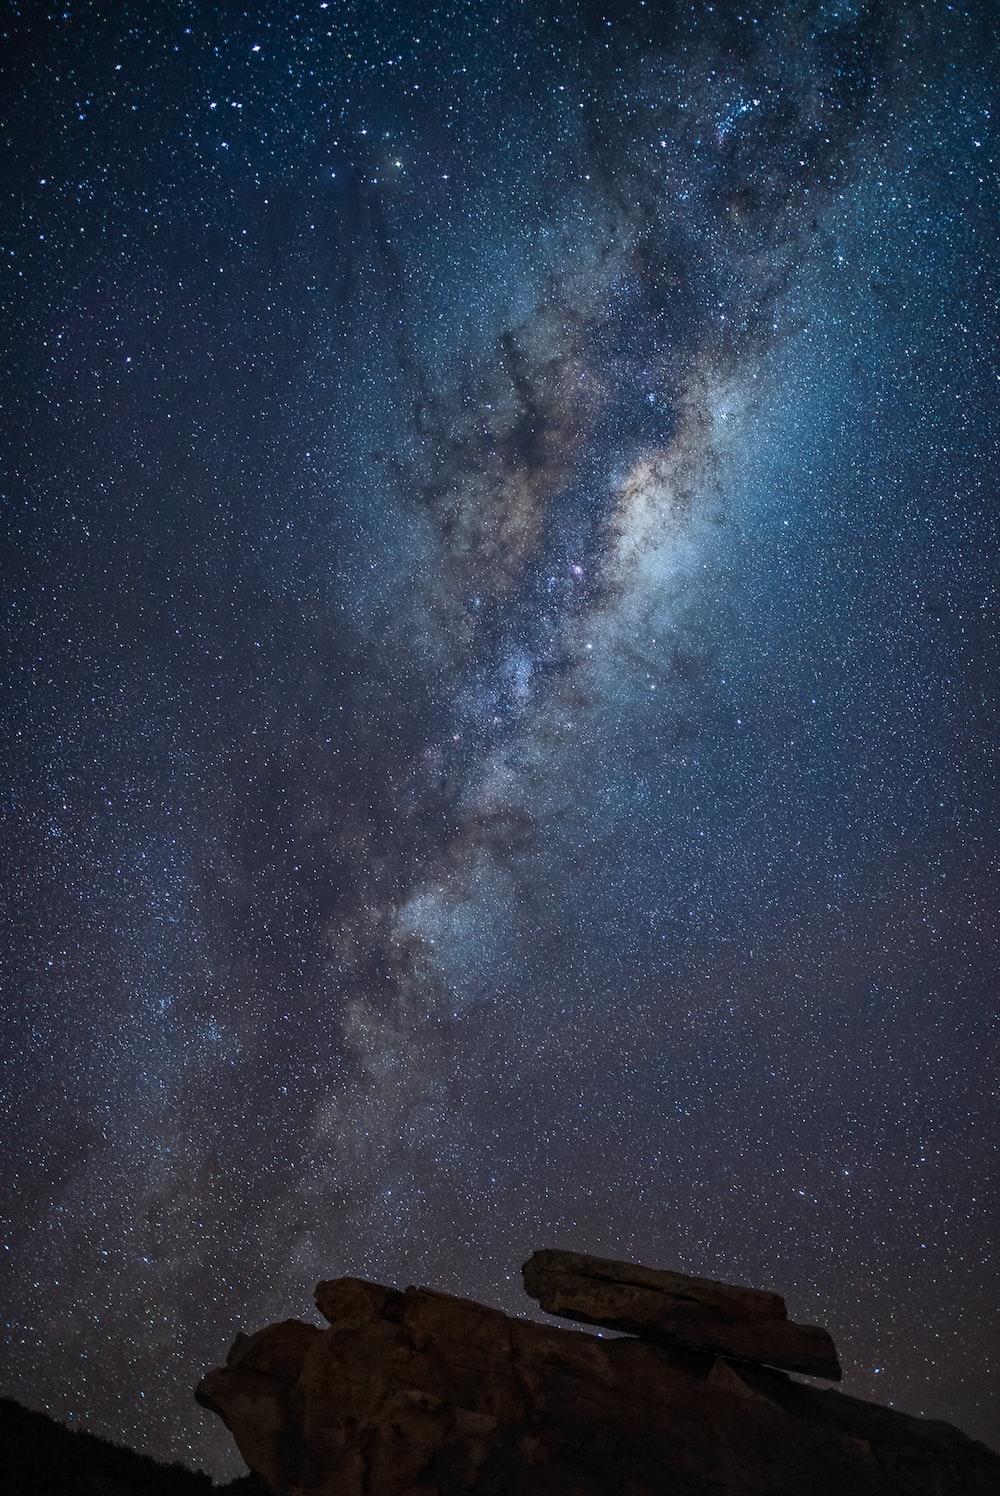 nebula over rock formation